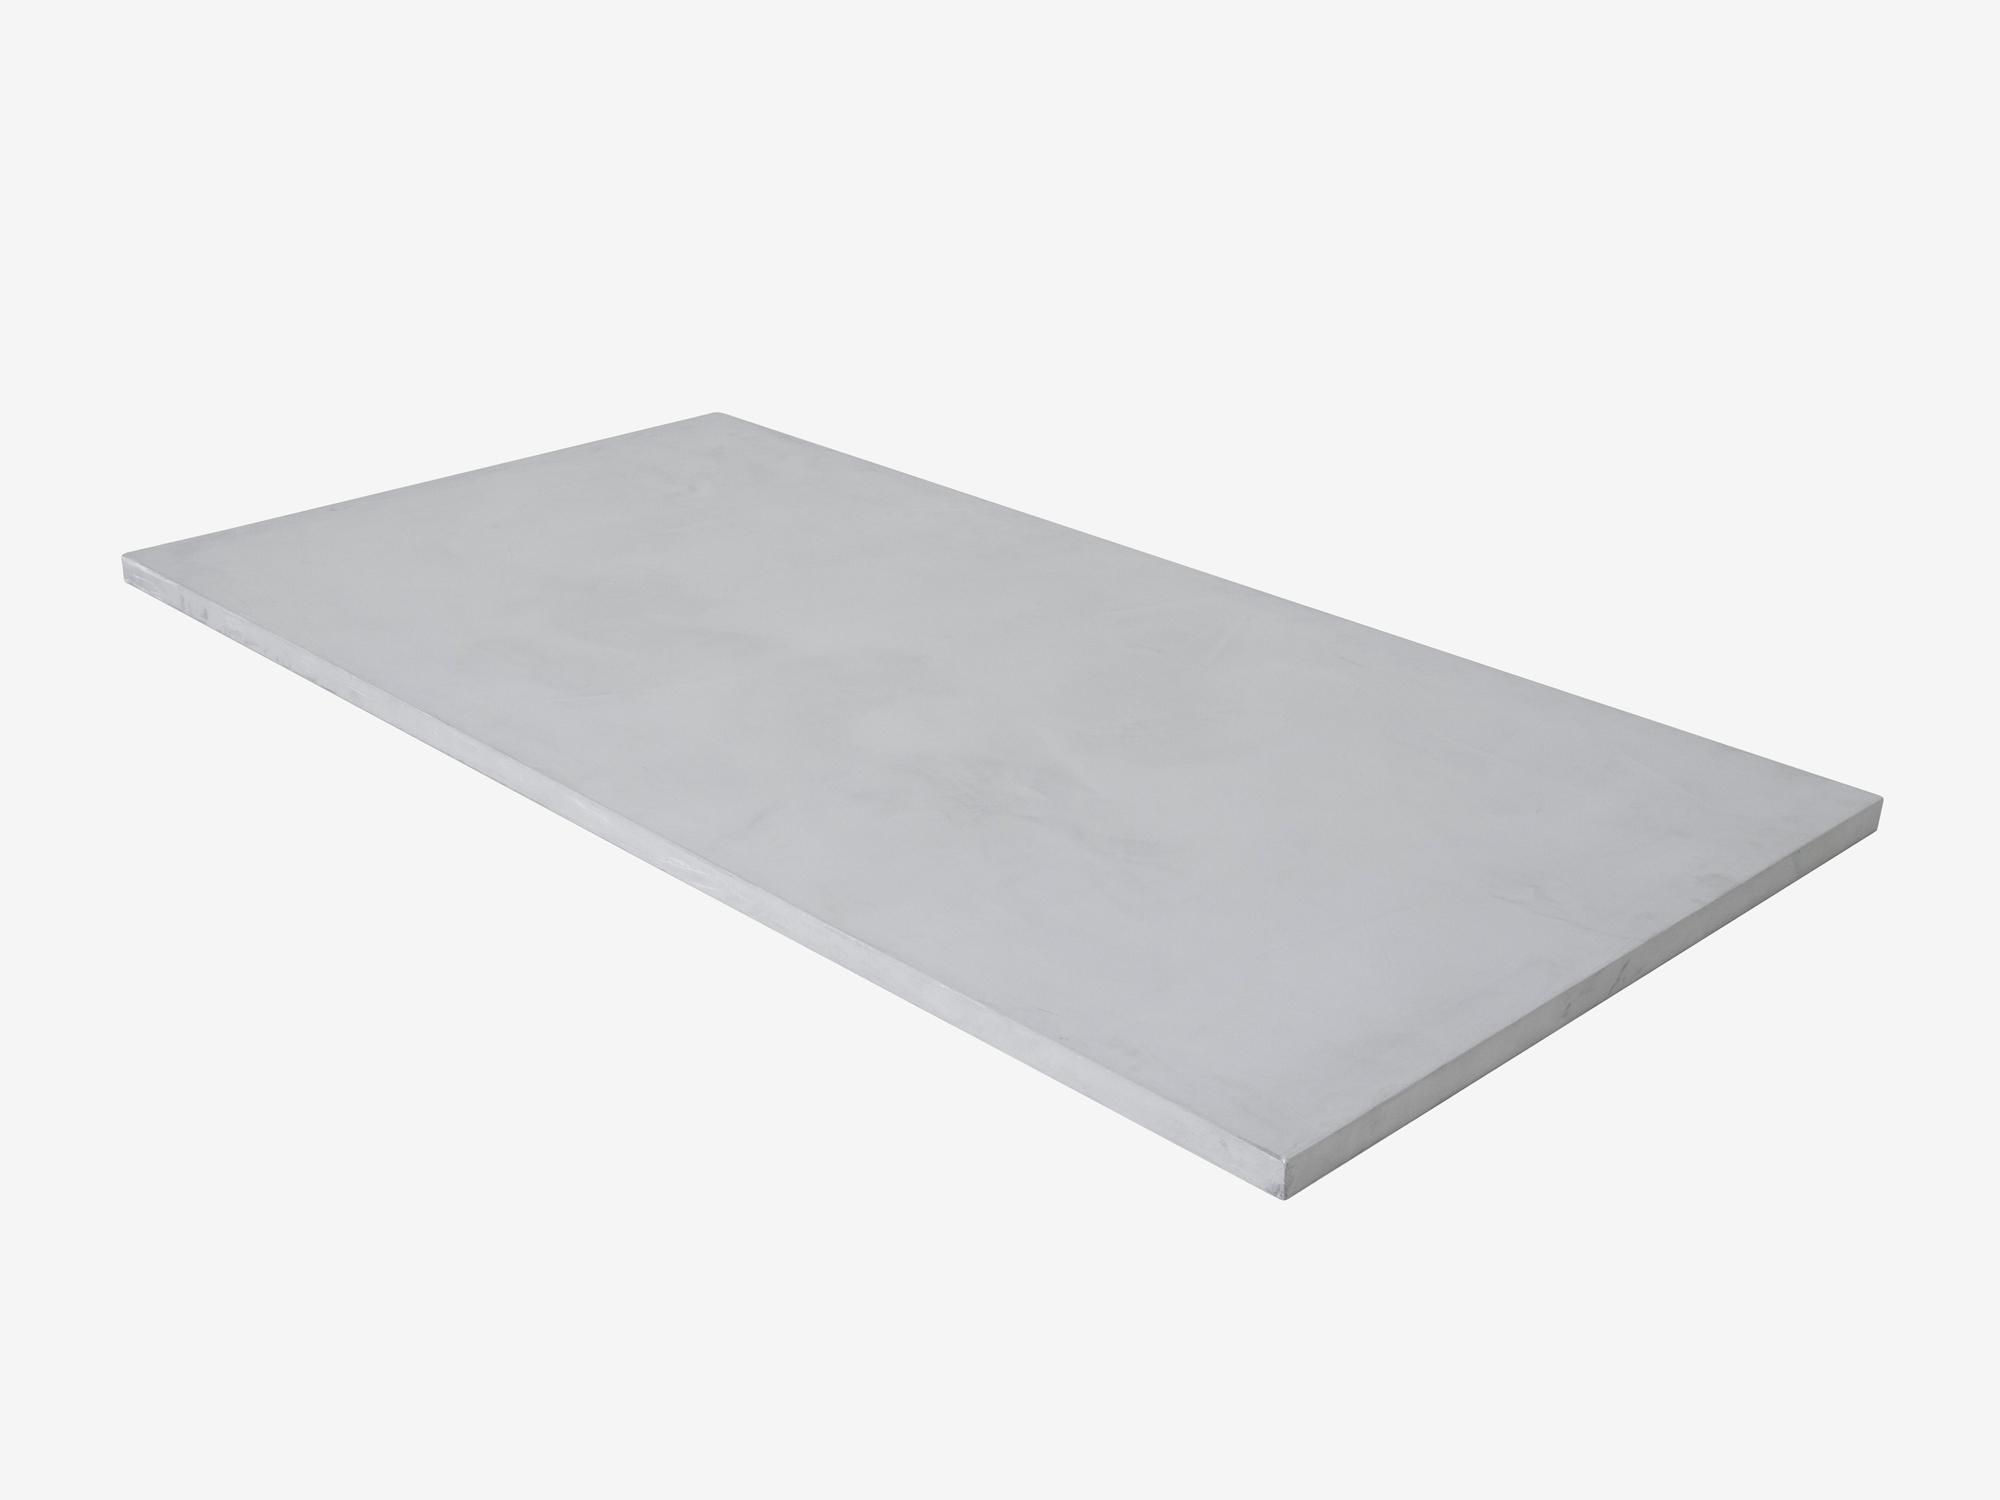 Betonlook Eettafel Stevik  FRN betonlook meubelen